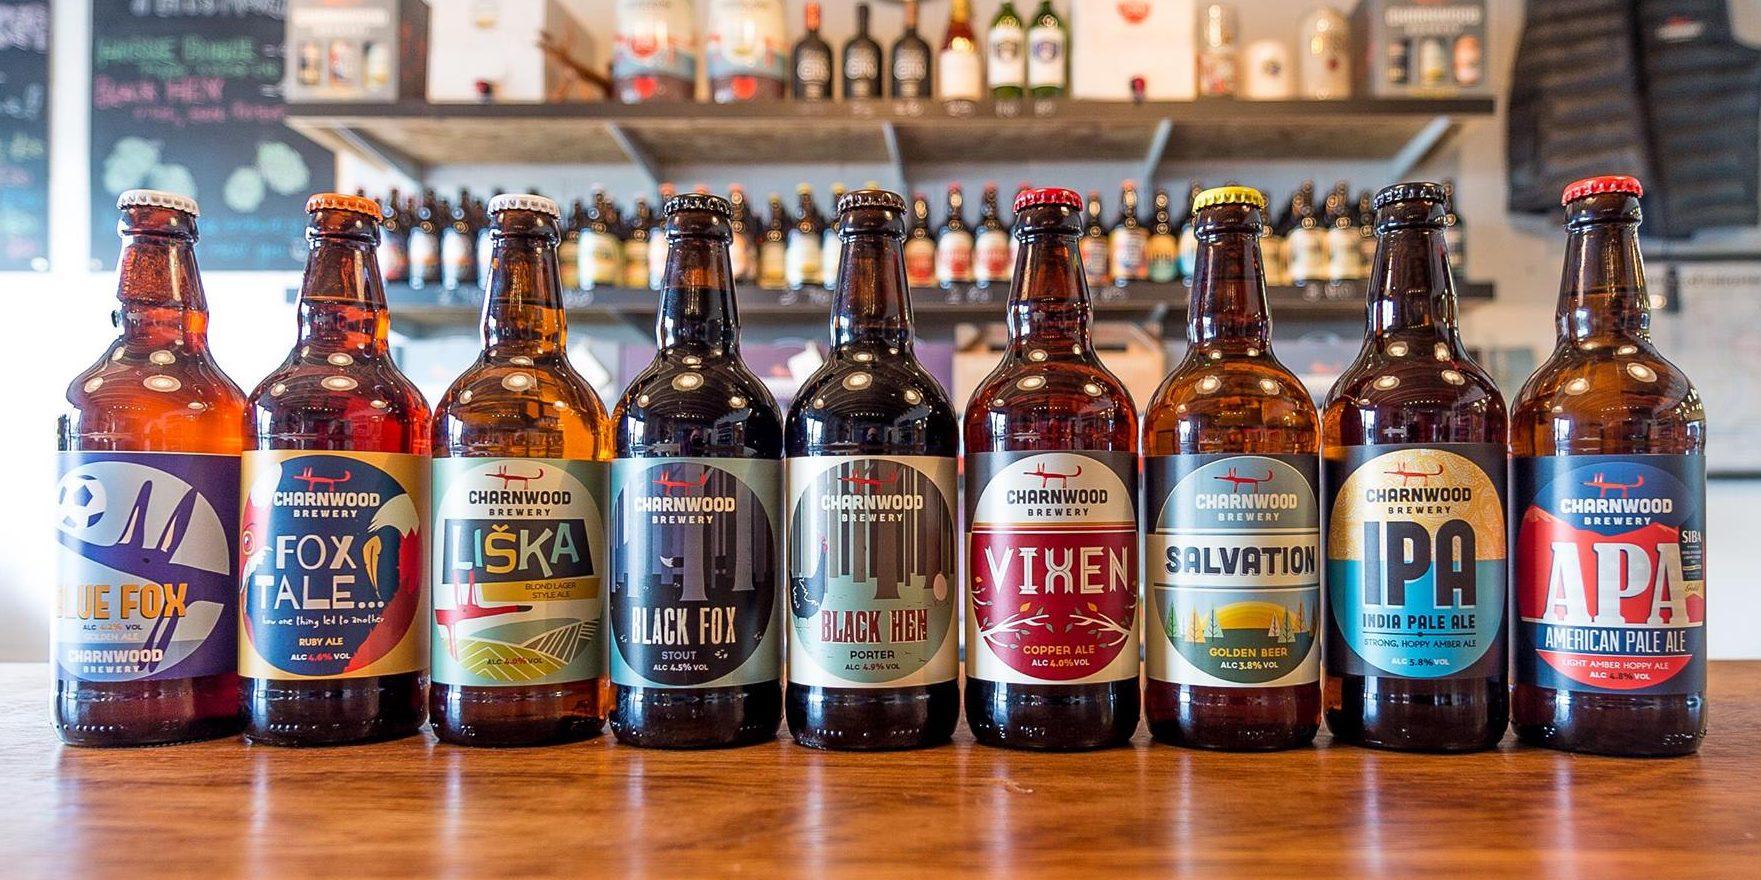 Charnwood Brewery Beers